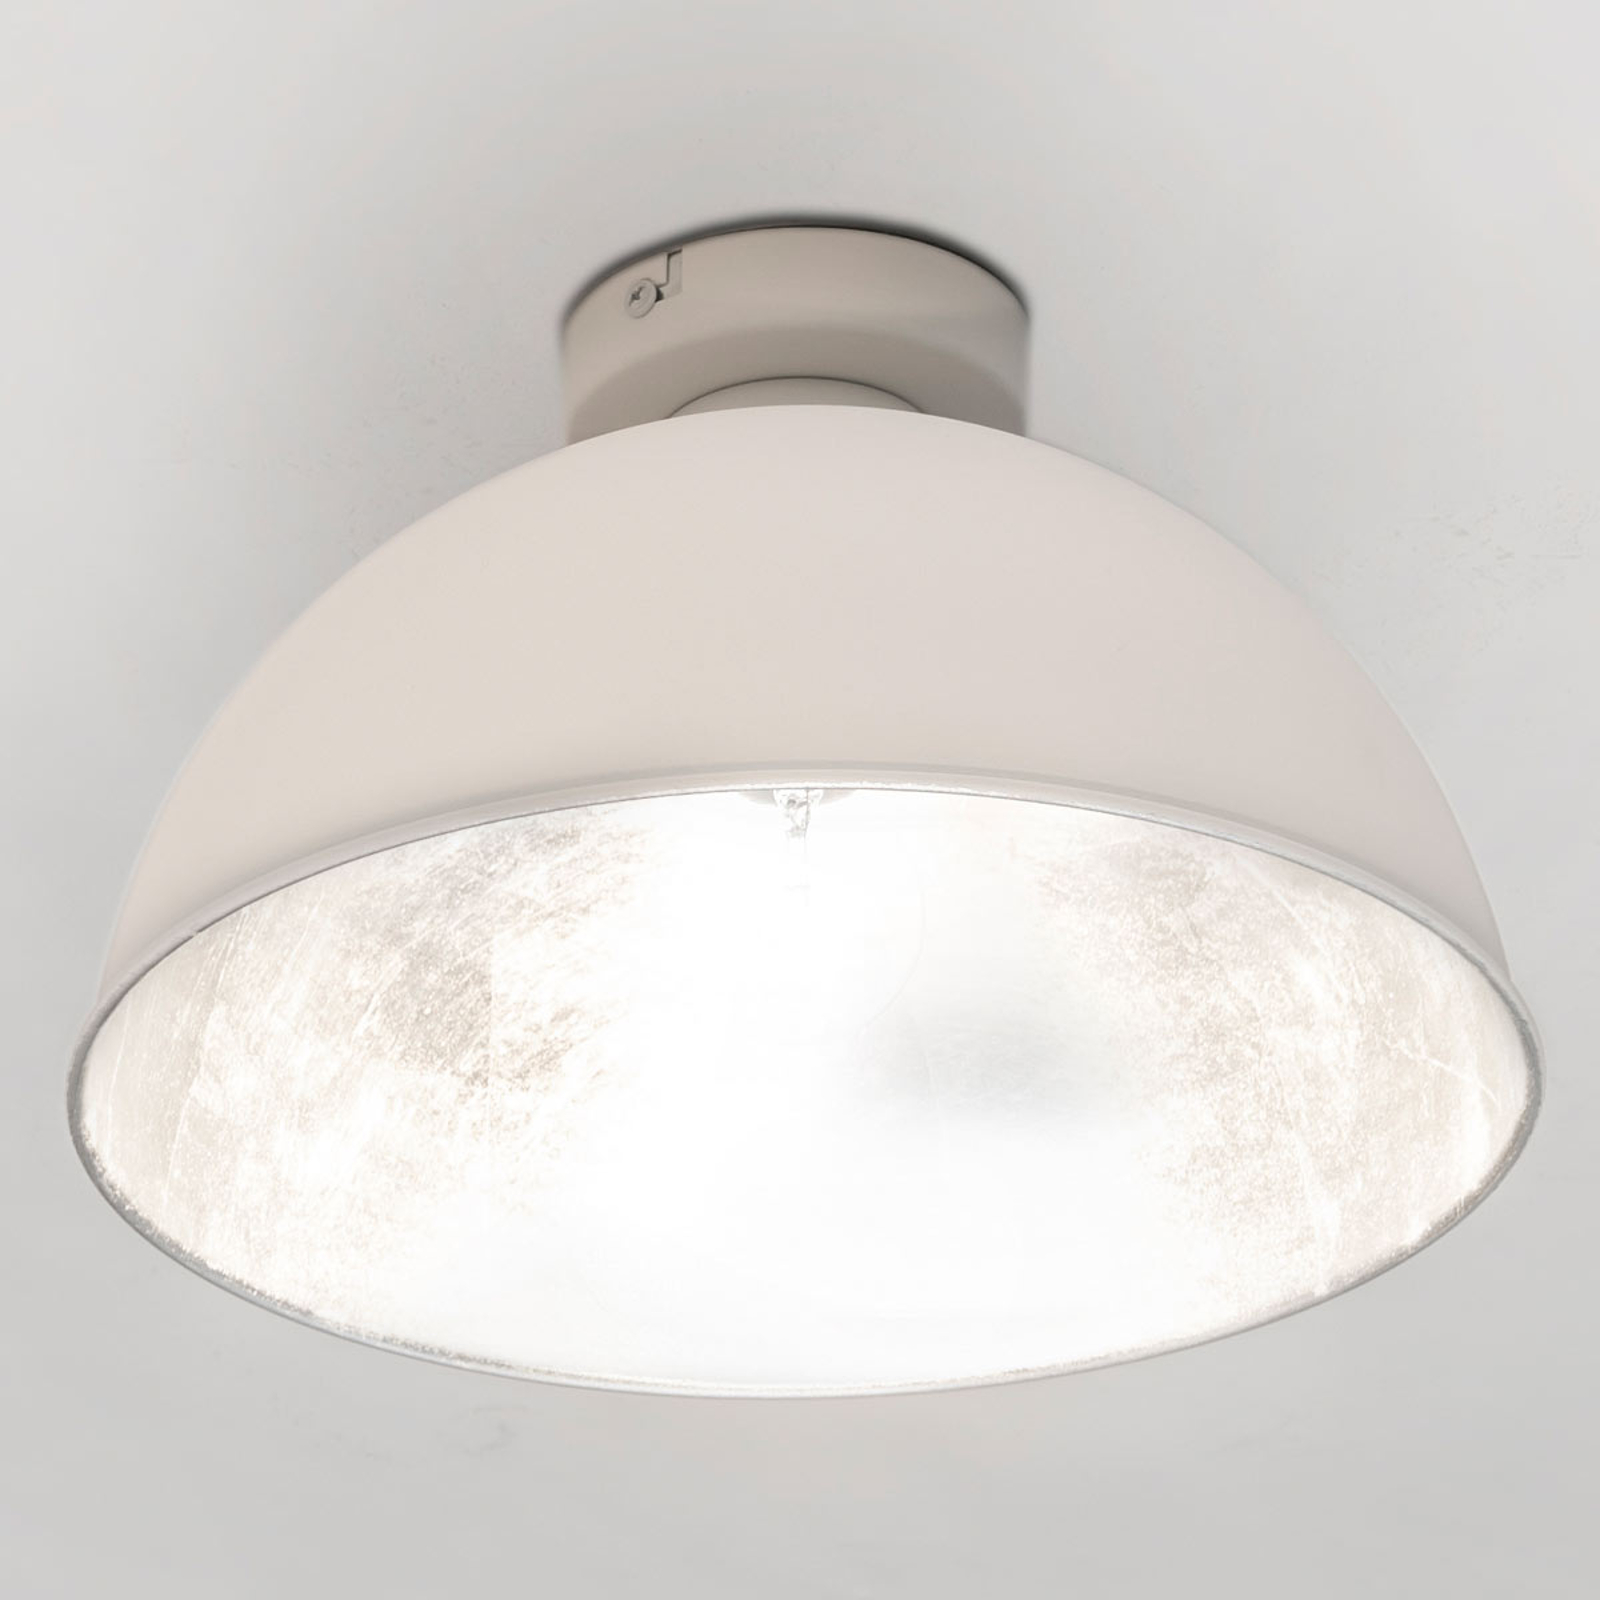 Industrialna lampa sufitowa JIMMY, biała/srebrna